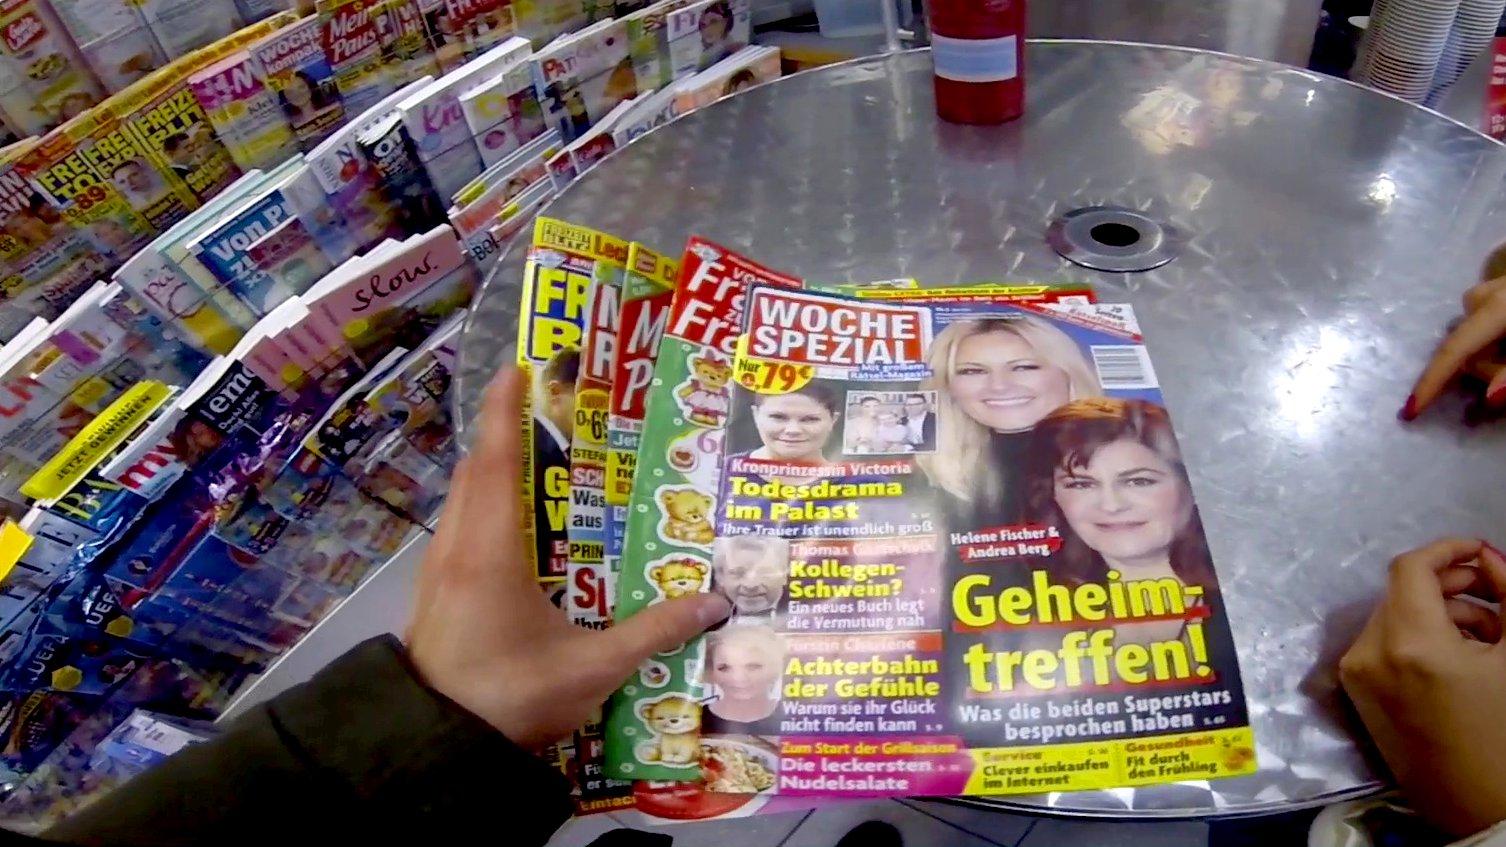 Gala, Bunte und Co. – so absurd ist die Regenbogenpresse